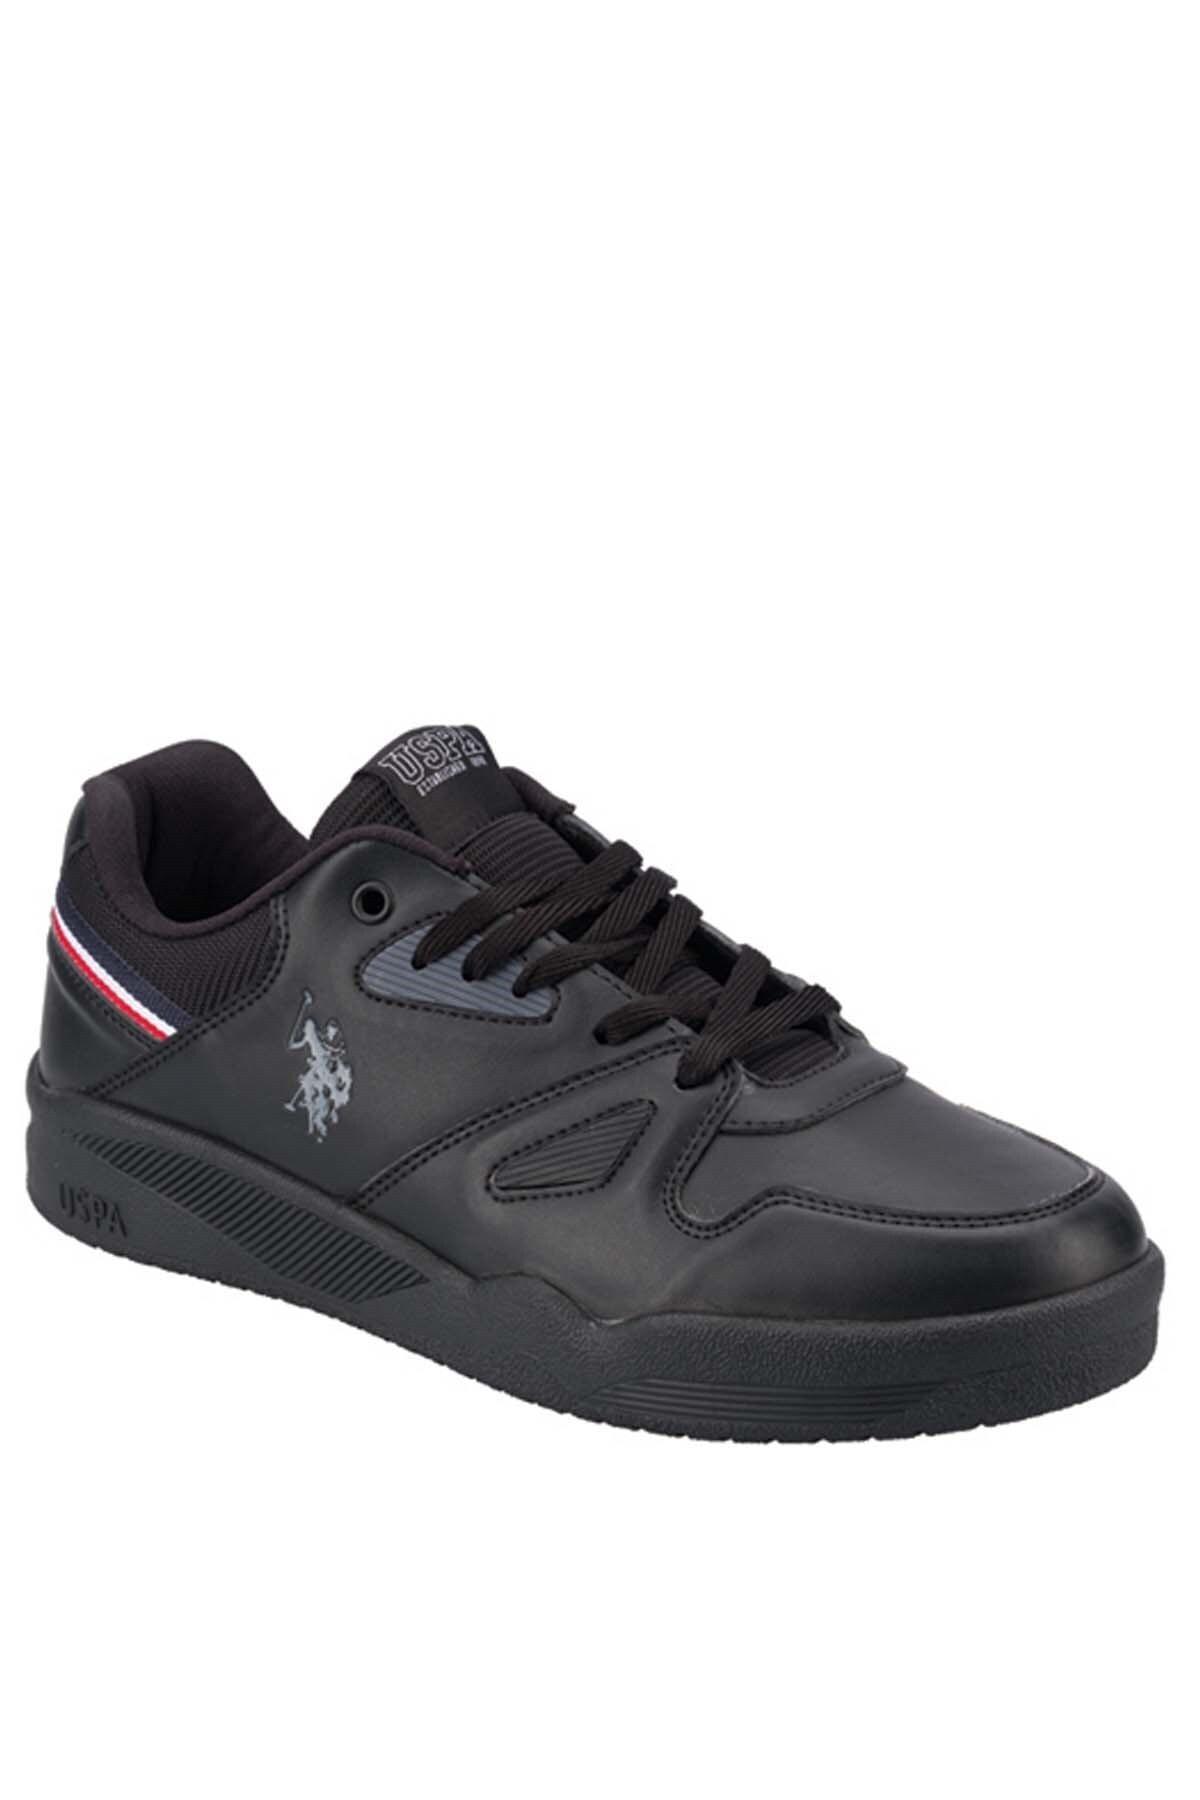 U.S POLO PARKER Siyah Erkek Sneaker Ayakkabı 100549165 1